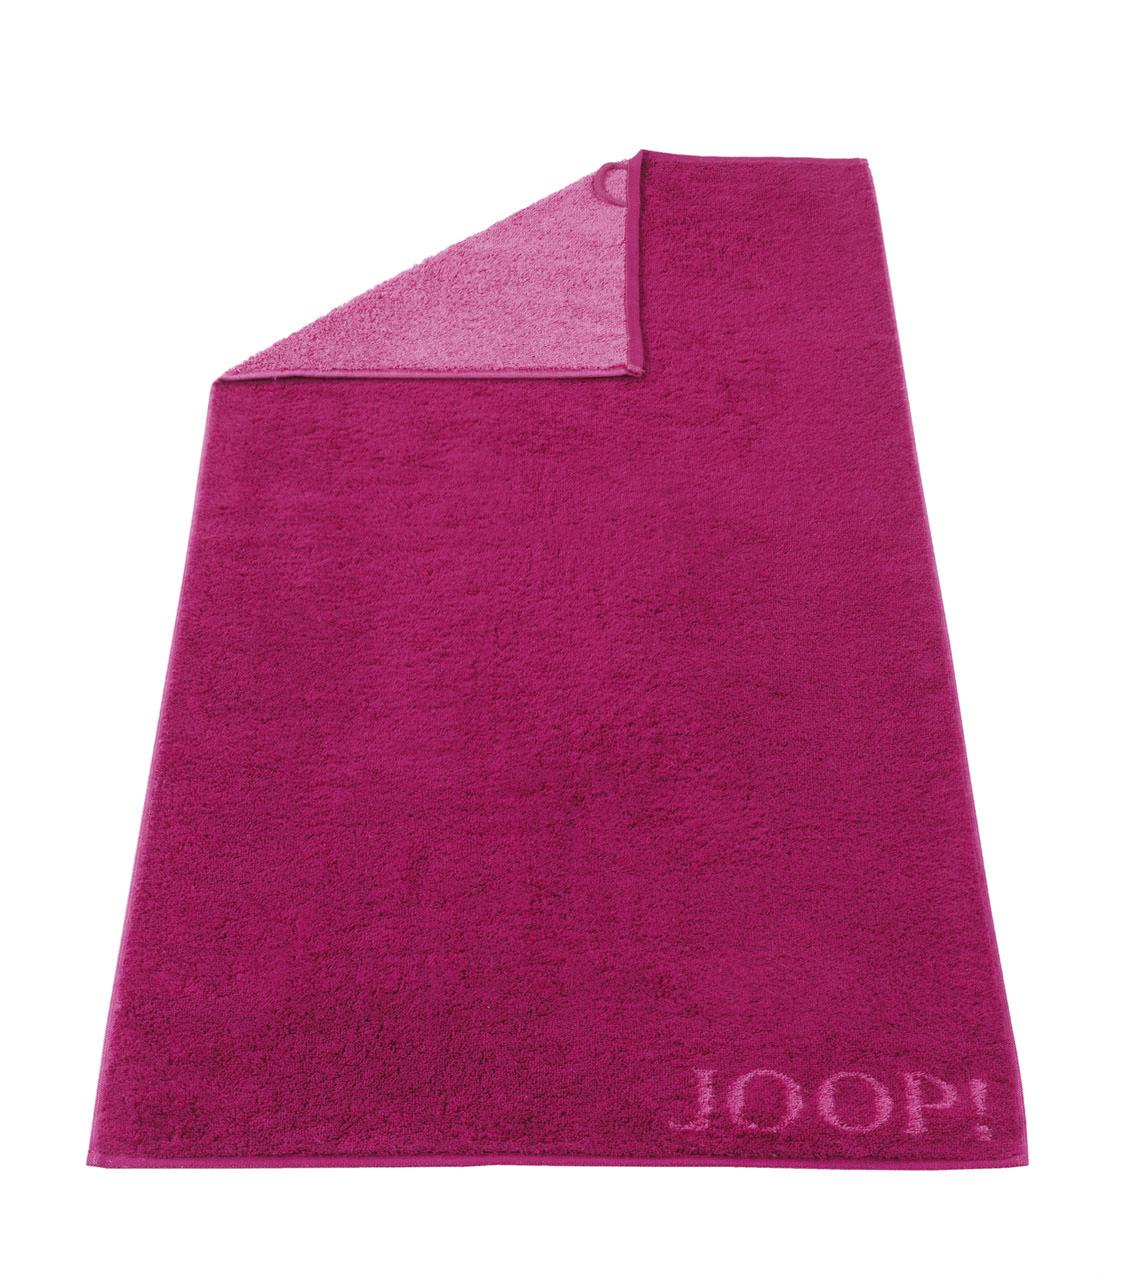 joop handtuch classic doubleface cassis 50x100cm. Black Bedroom Furniture Sets. Home Design Ideas